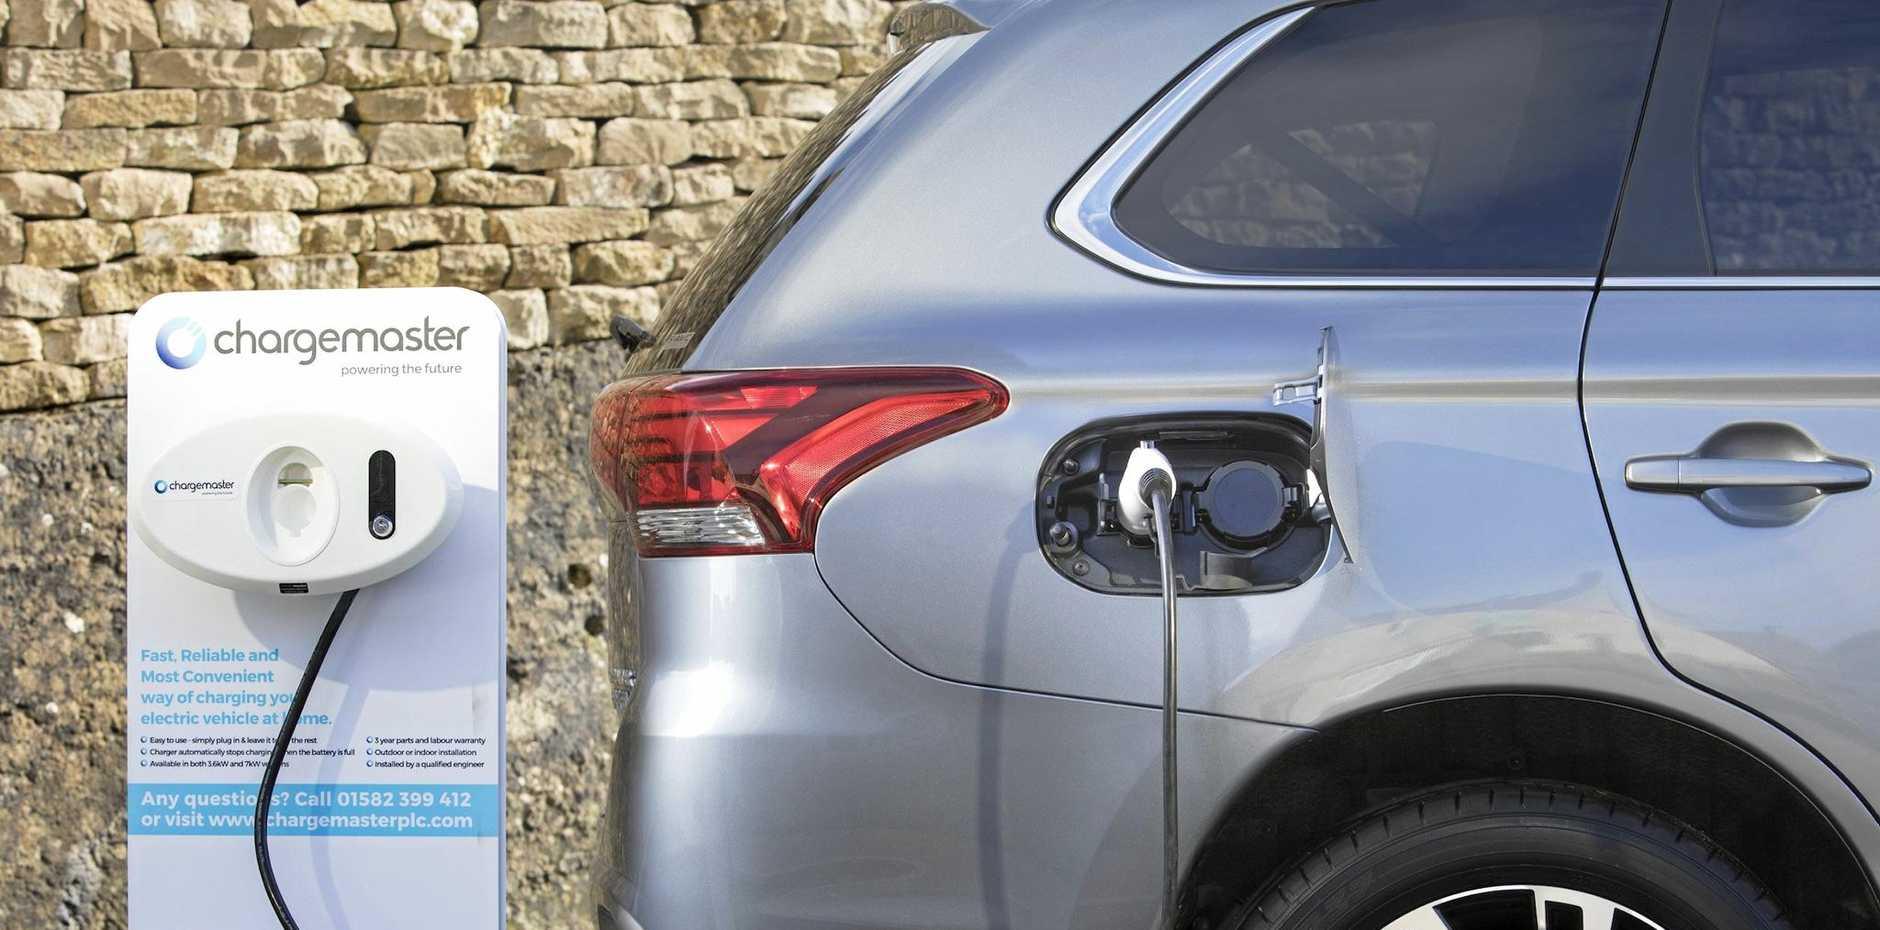 The 2017 Mitsubishi Outlander PHEV plug in hybrid.